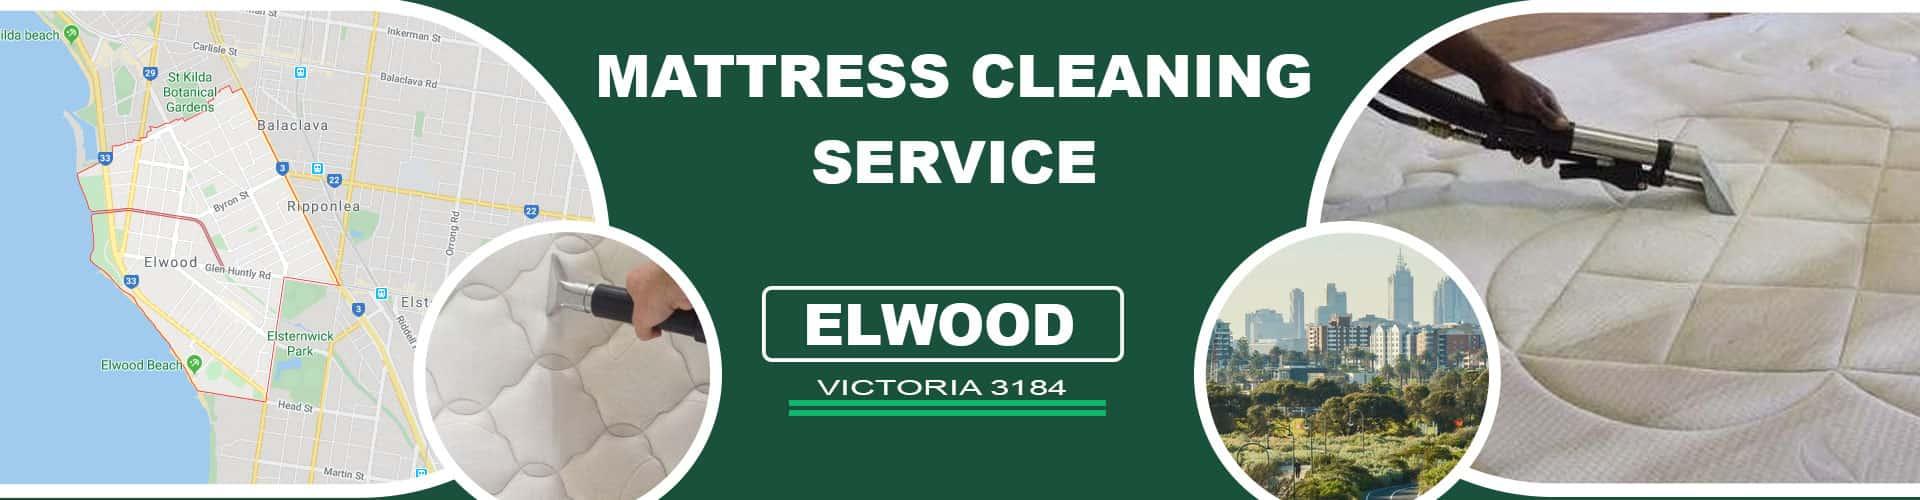 Mattress Cleaning Elwood